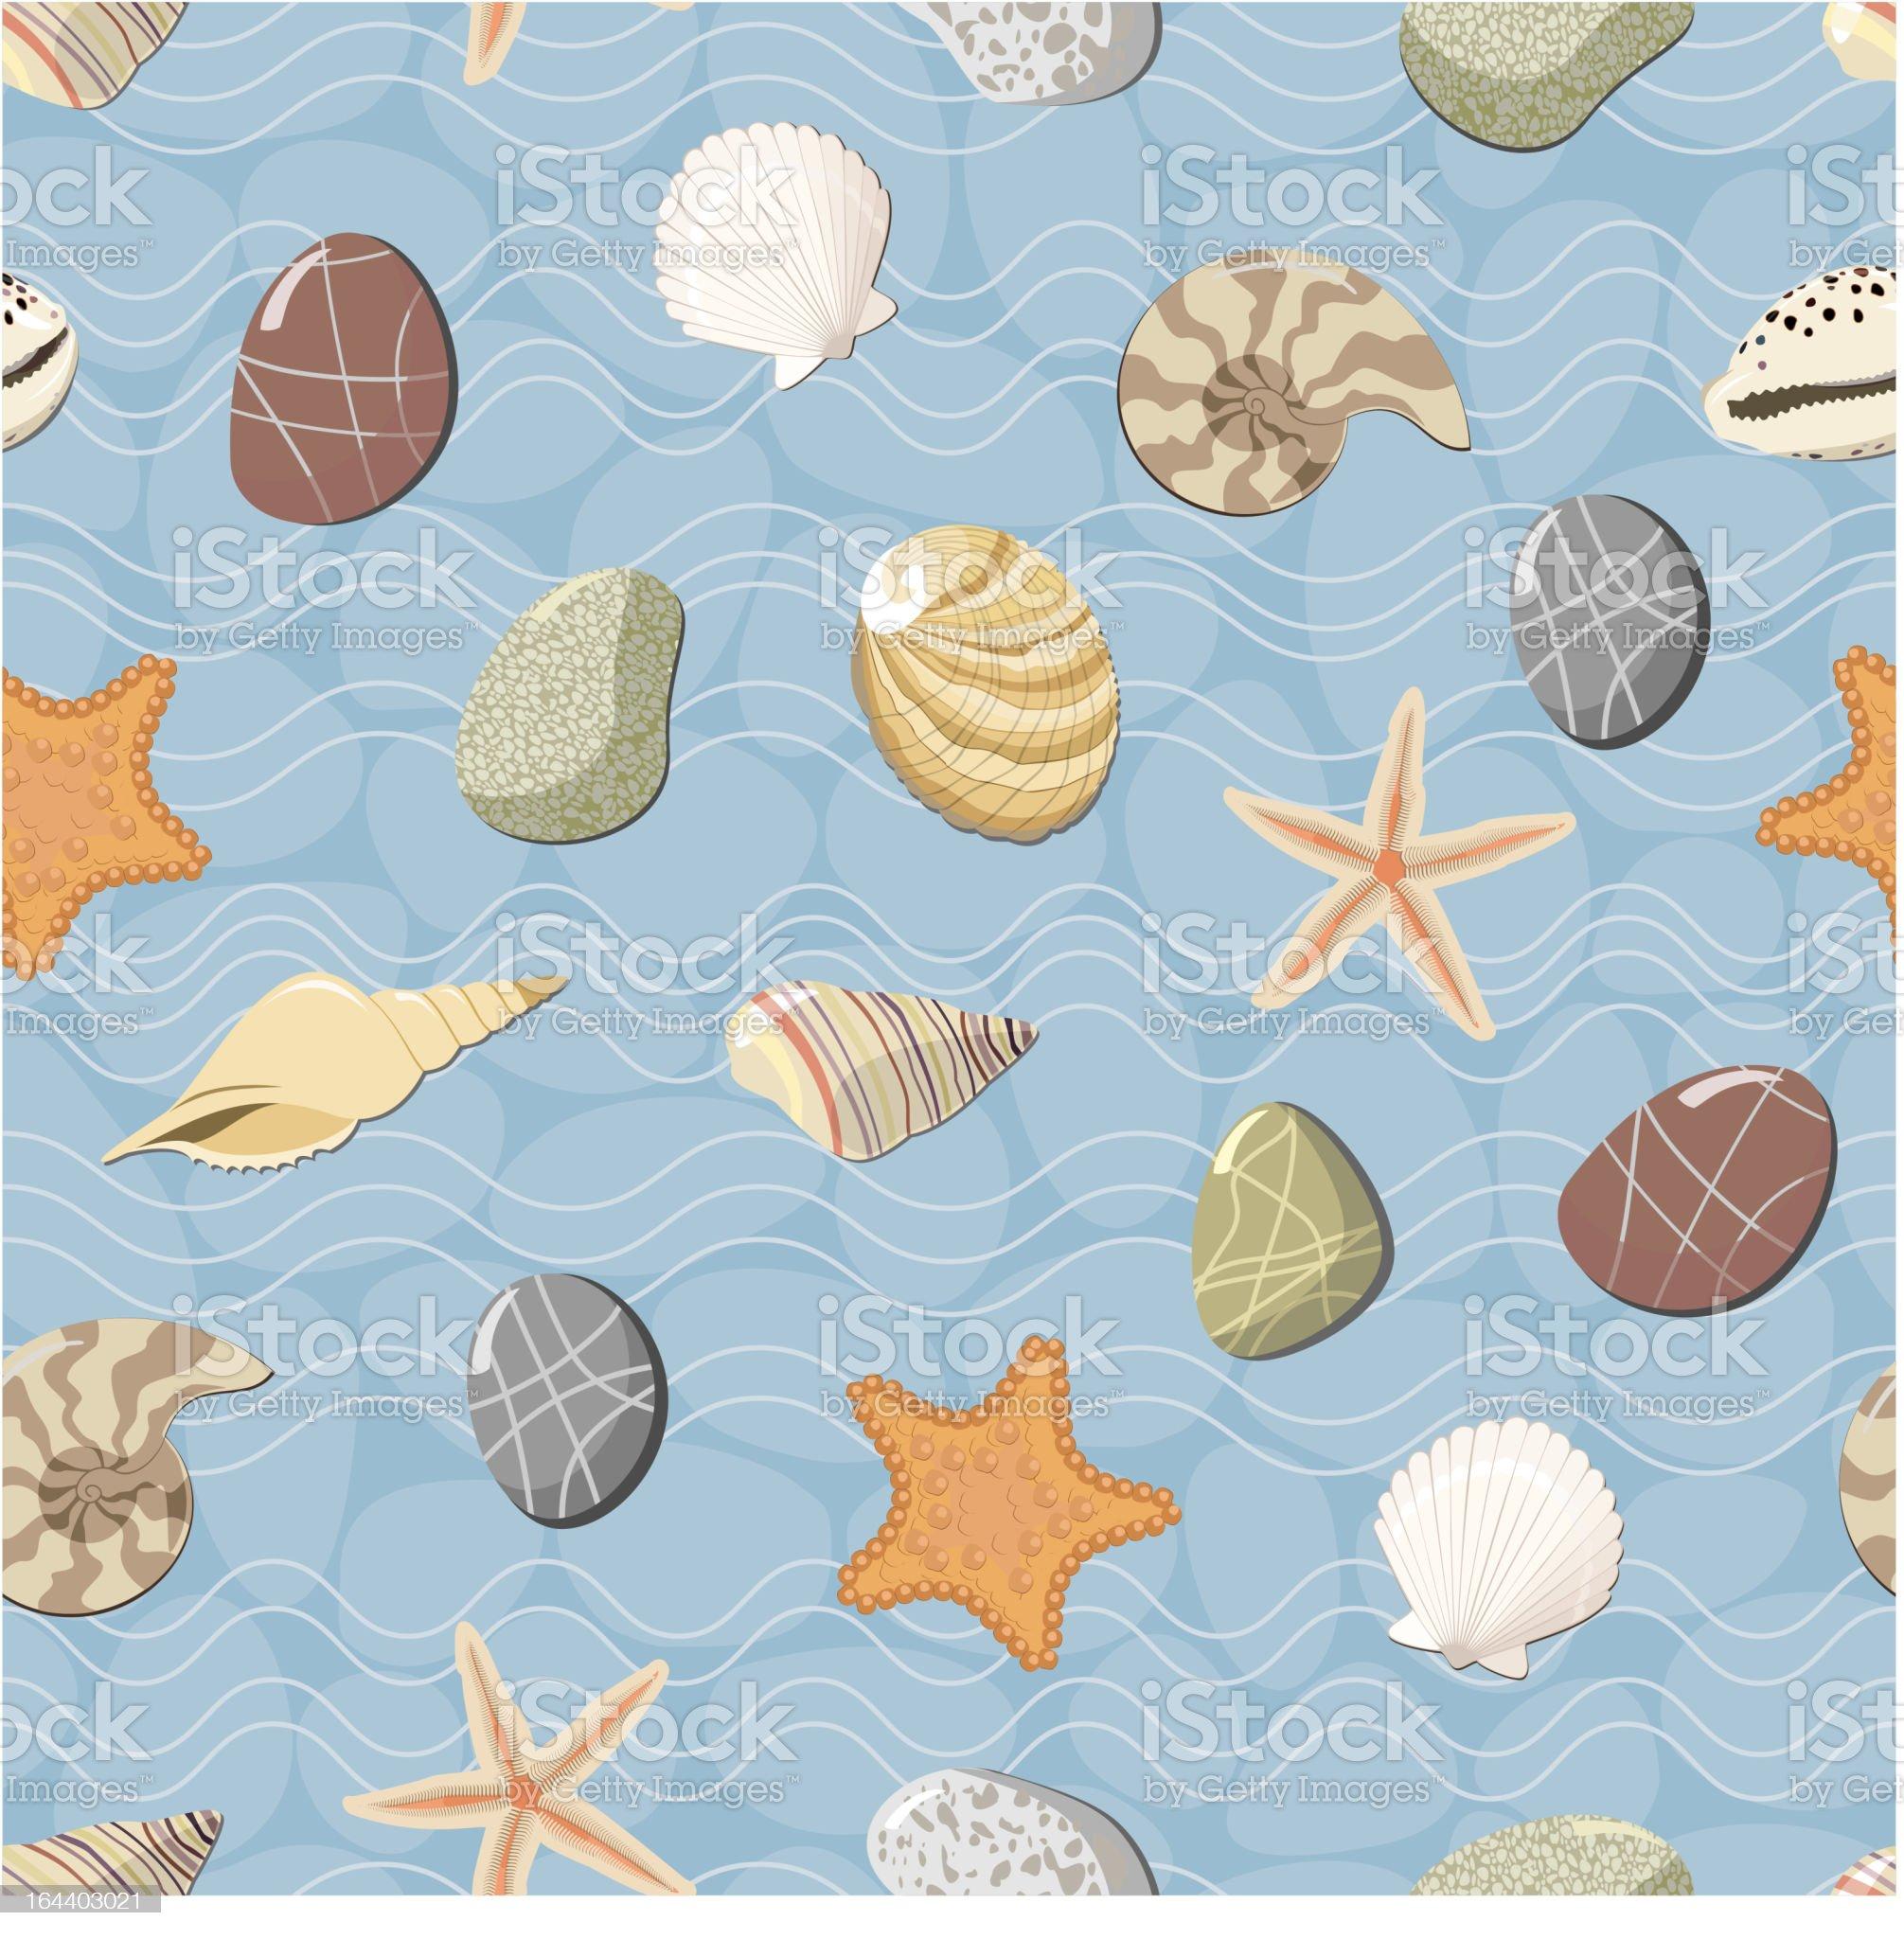 Marine seamless pattern. royalty-free stock vector art